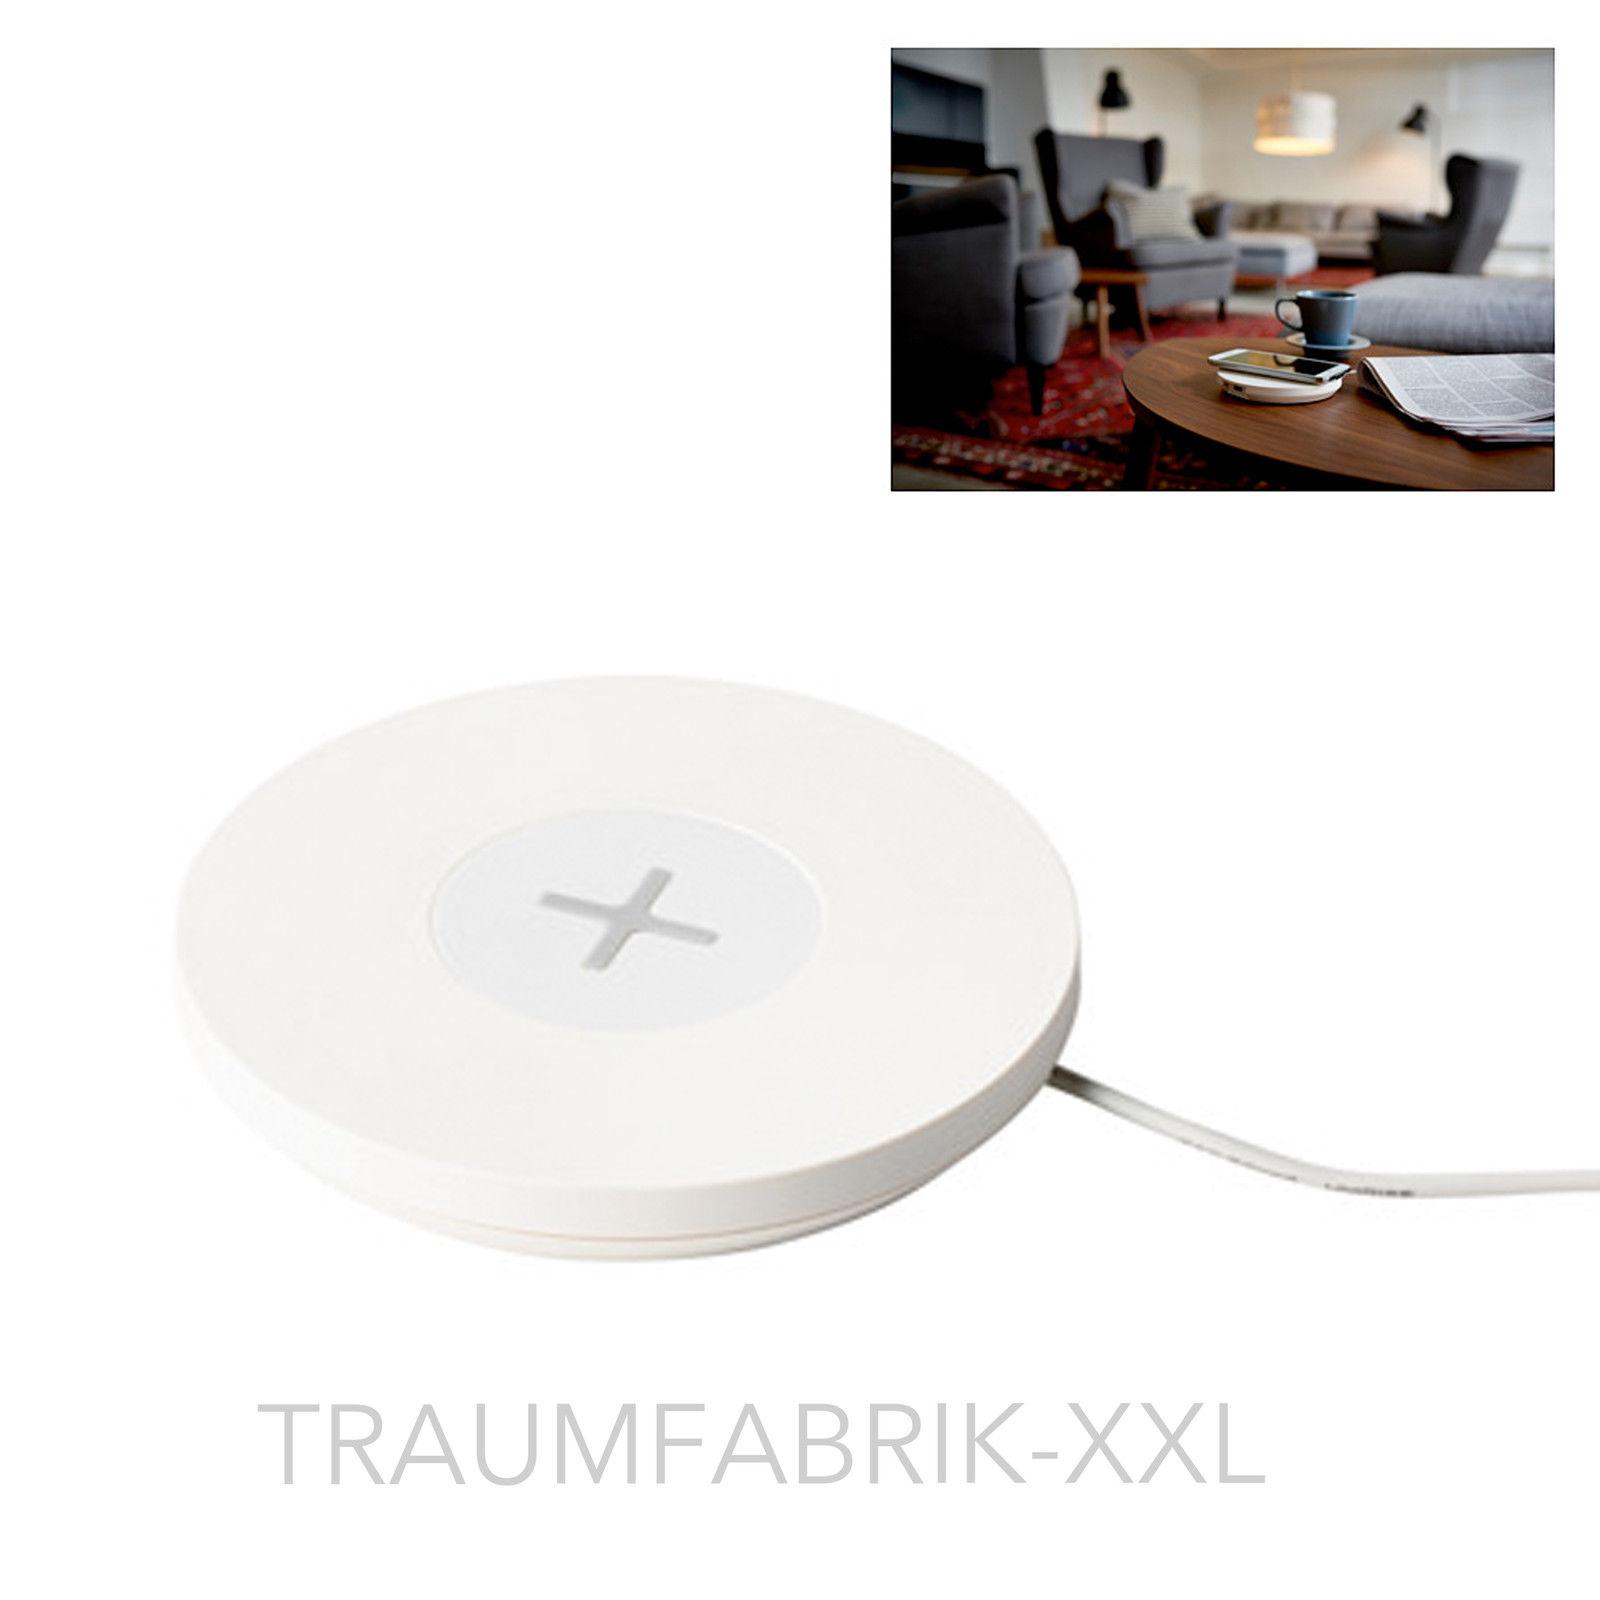 design ladestation f r 1 ger t handy weiss kabelloses laden dockingstation neu traumfabrik xxl. Black Bedroom Furniture Sets. Home Design Ideas